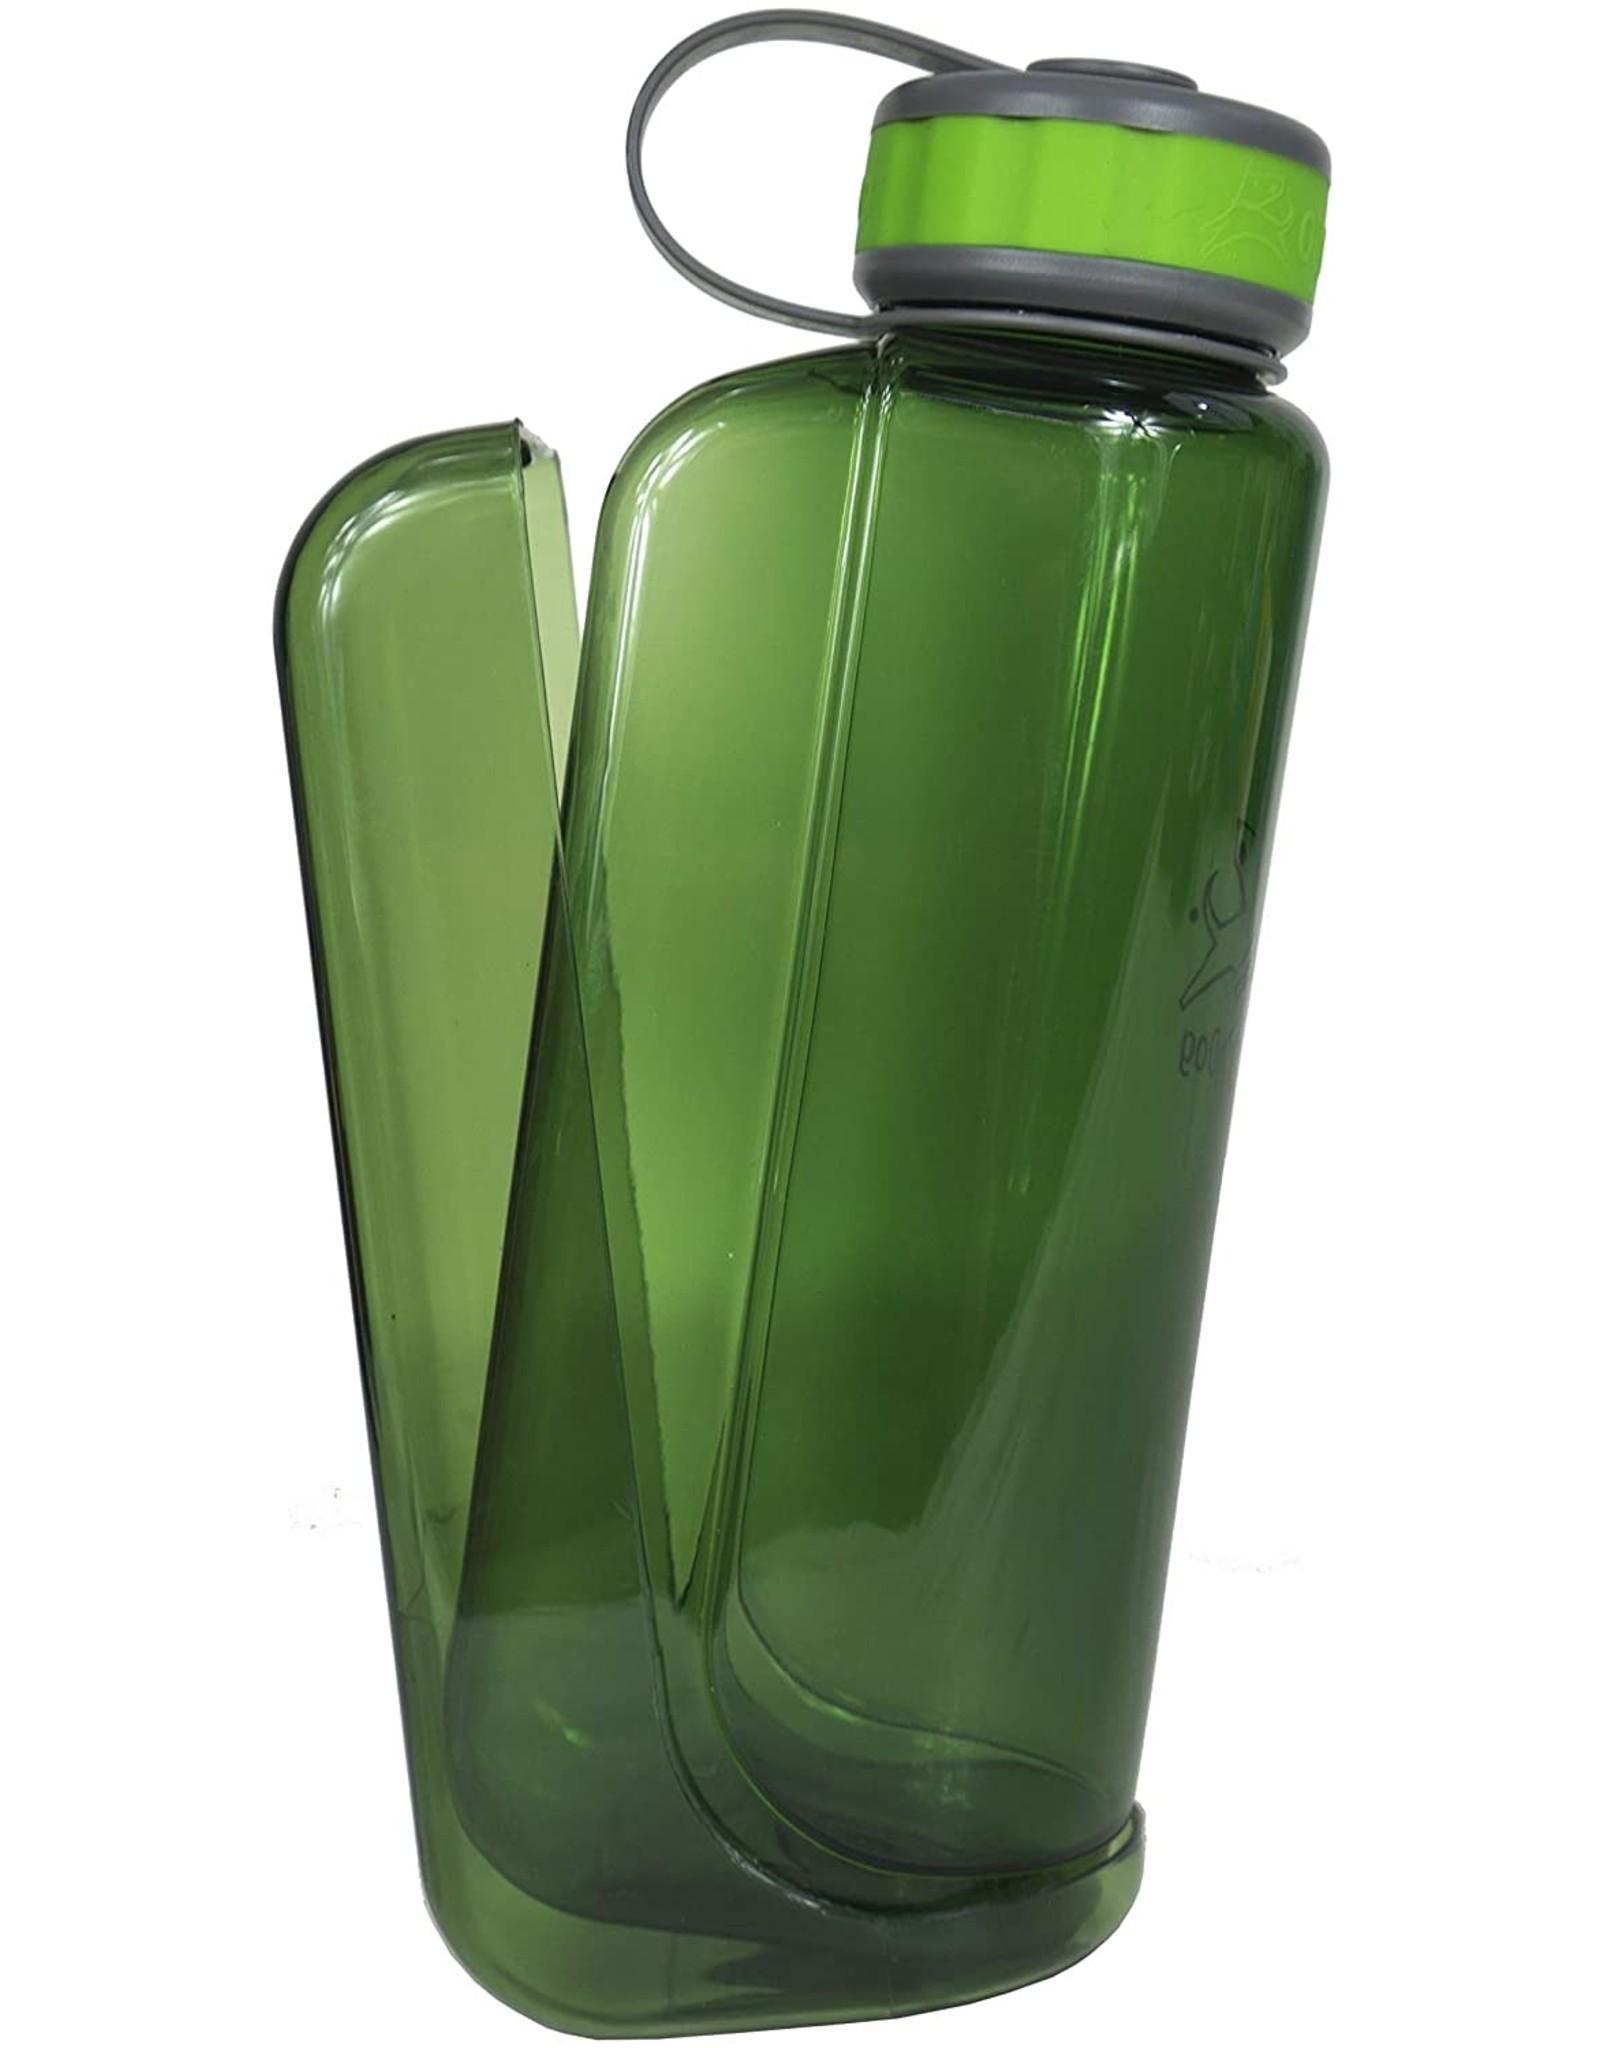 OllyDog OllyBottle: Grass, 1 L